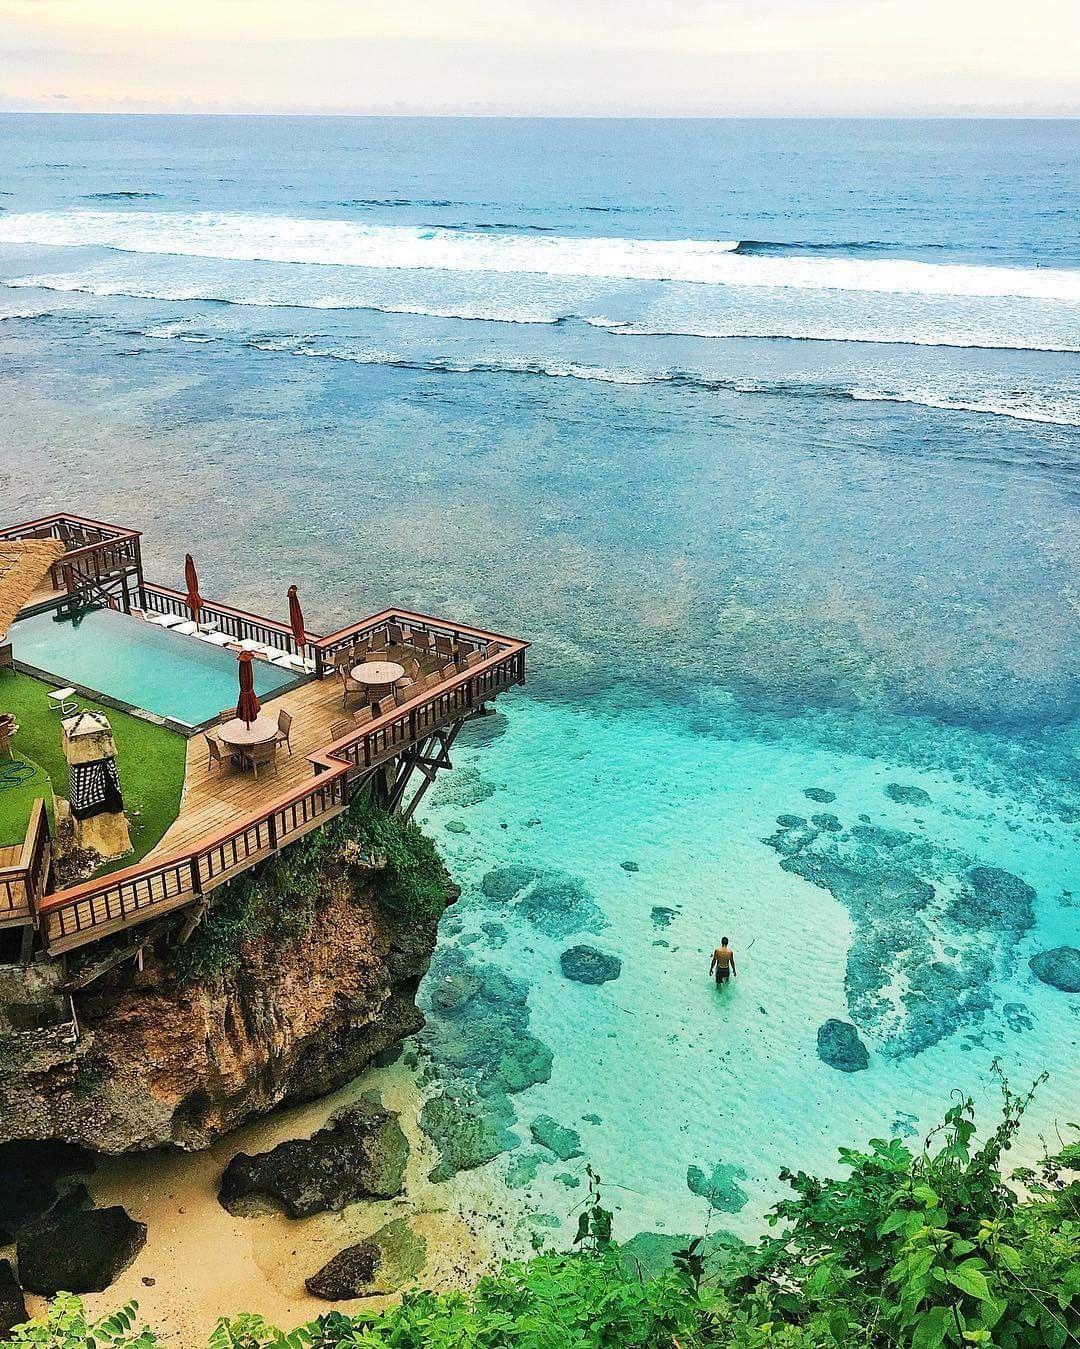 Zoltan Uhlar Suluban Beach Bali Indonesia Bali Travel